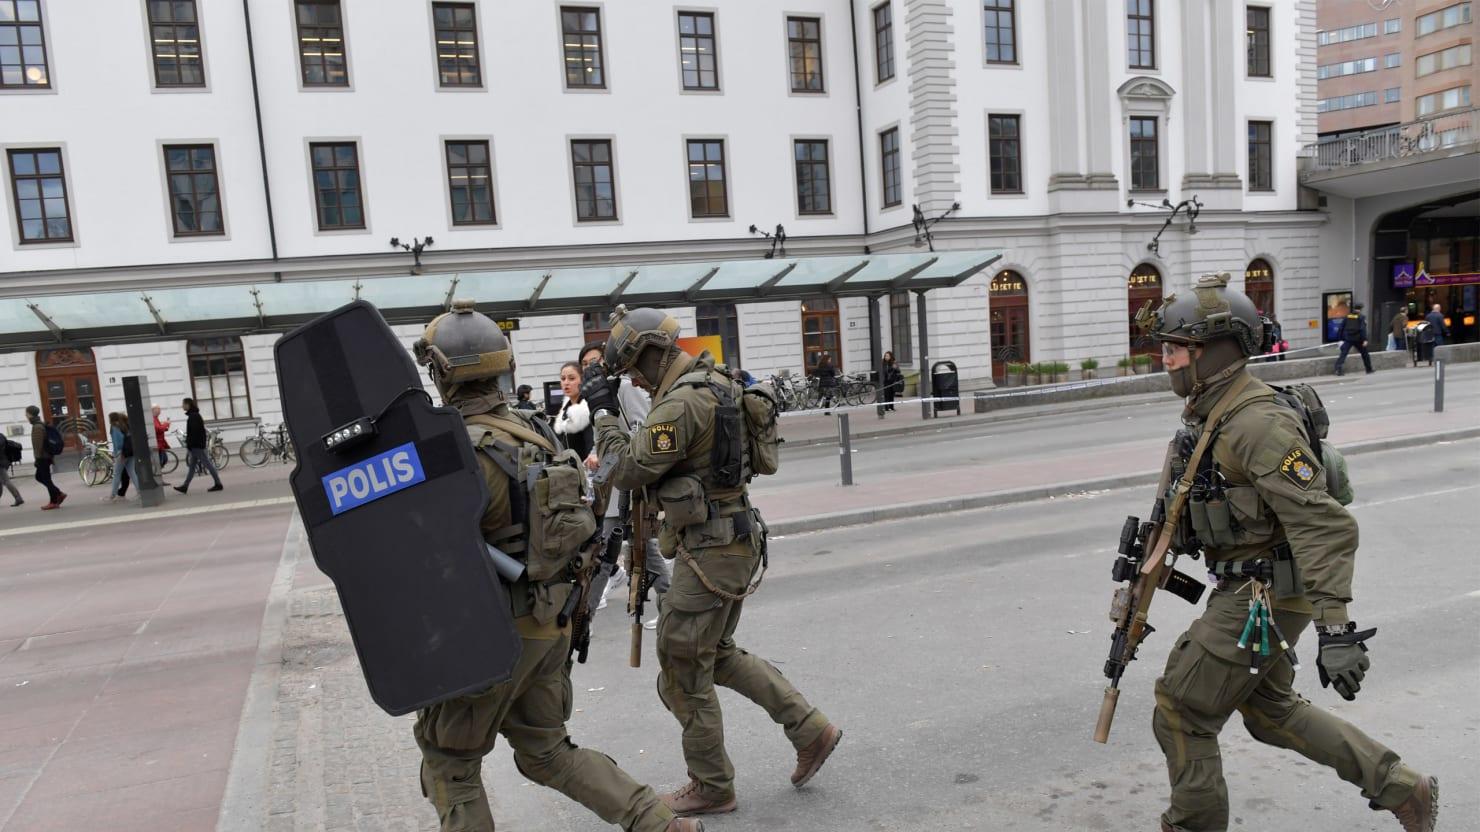 Terrorist Photo: Sweden Labels Assault A 'Terrorist Attack'